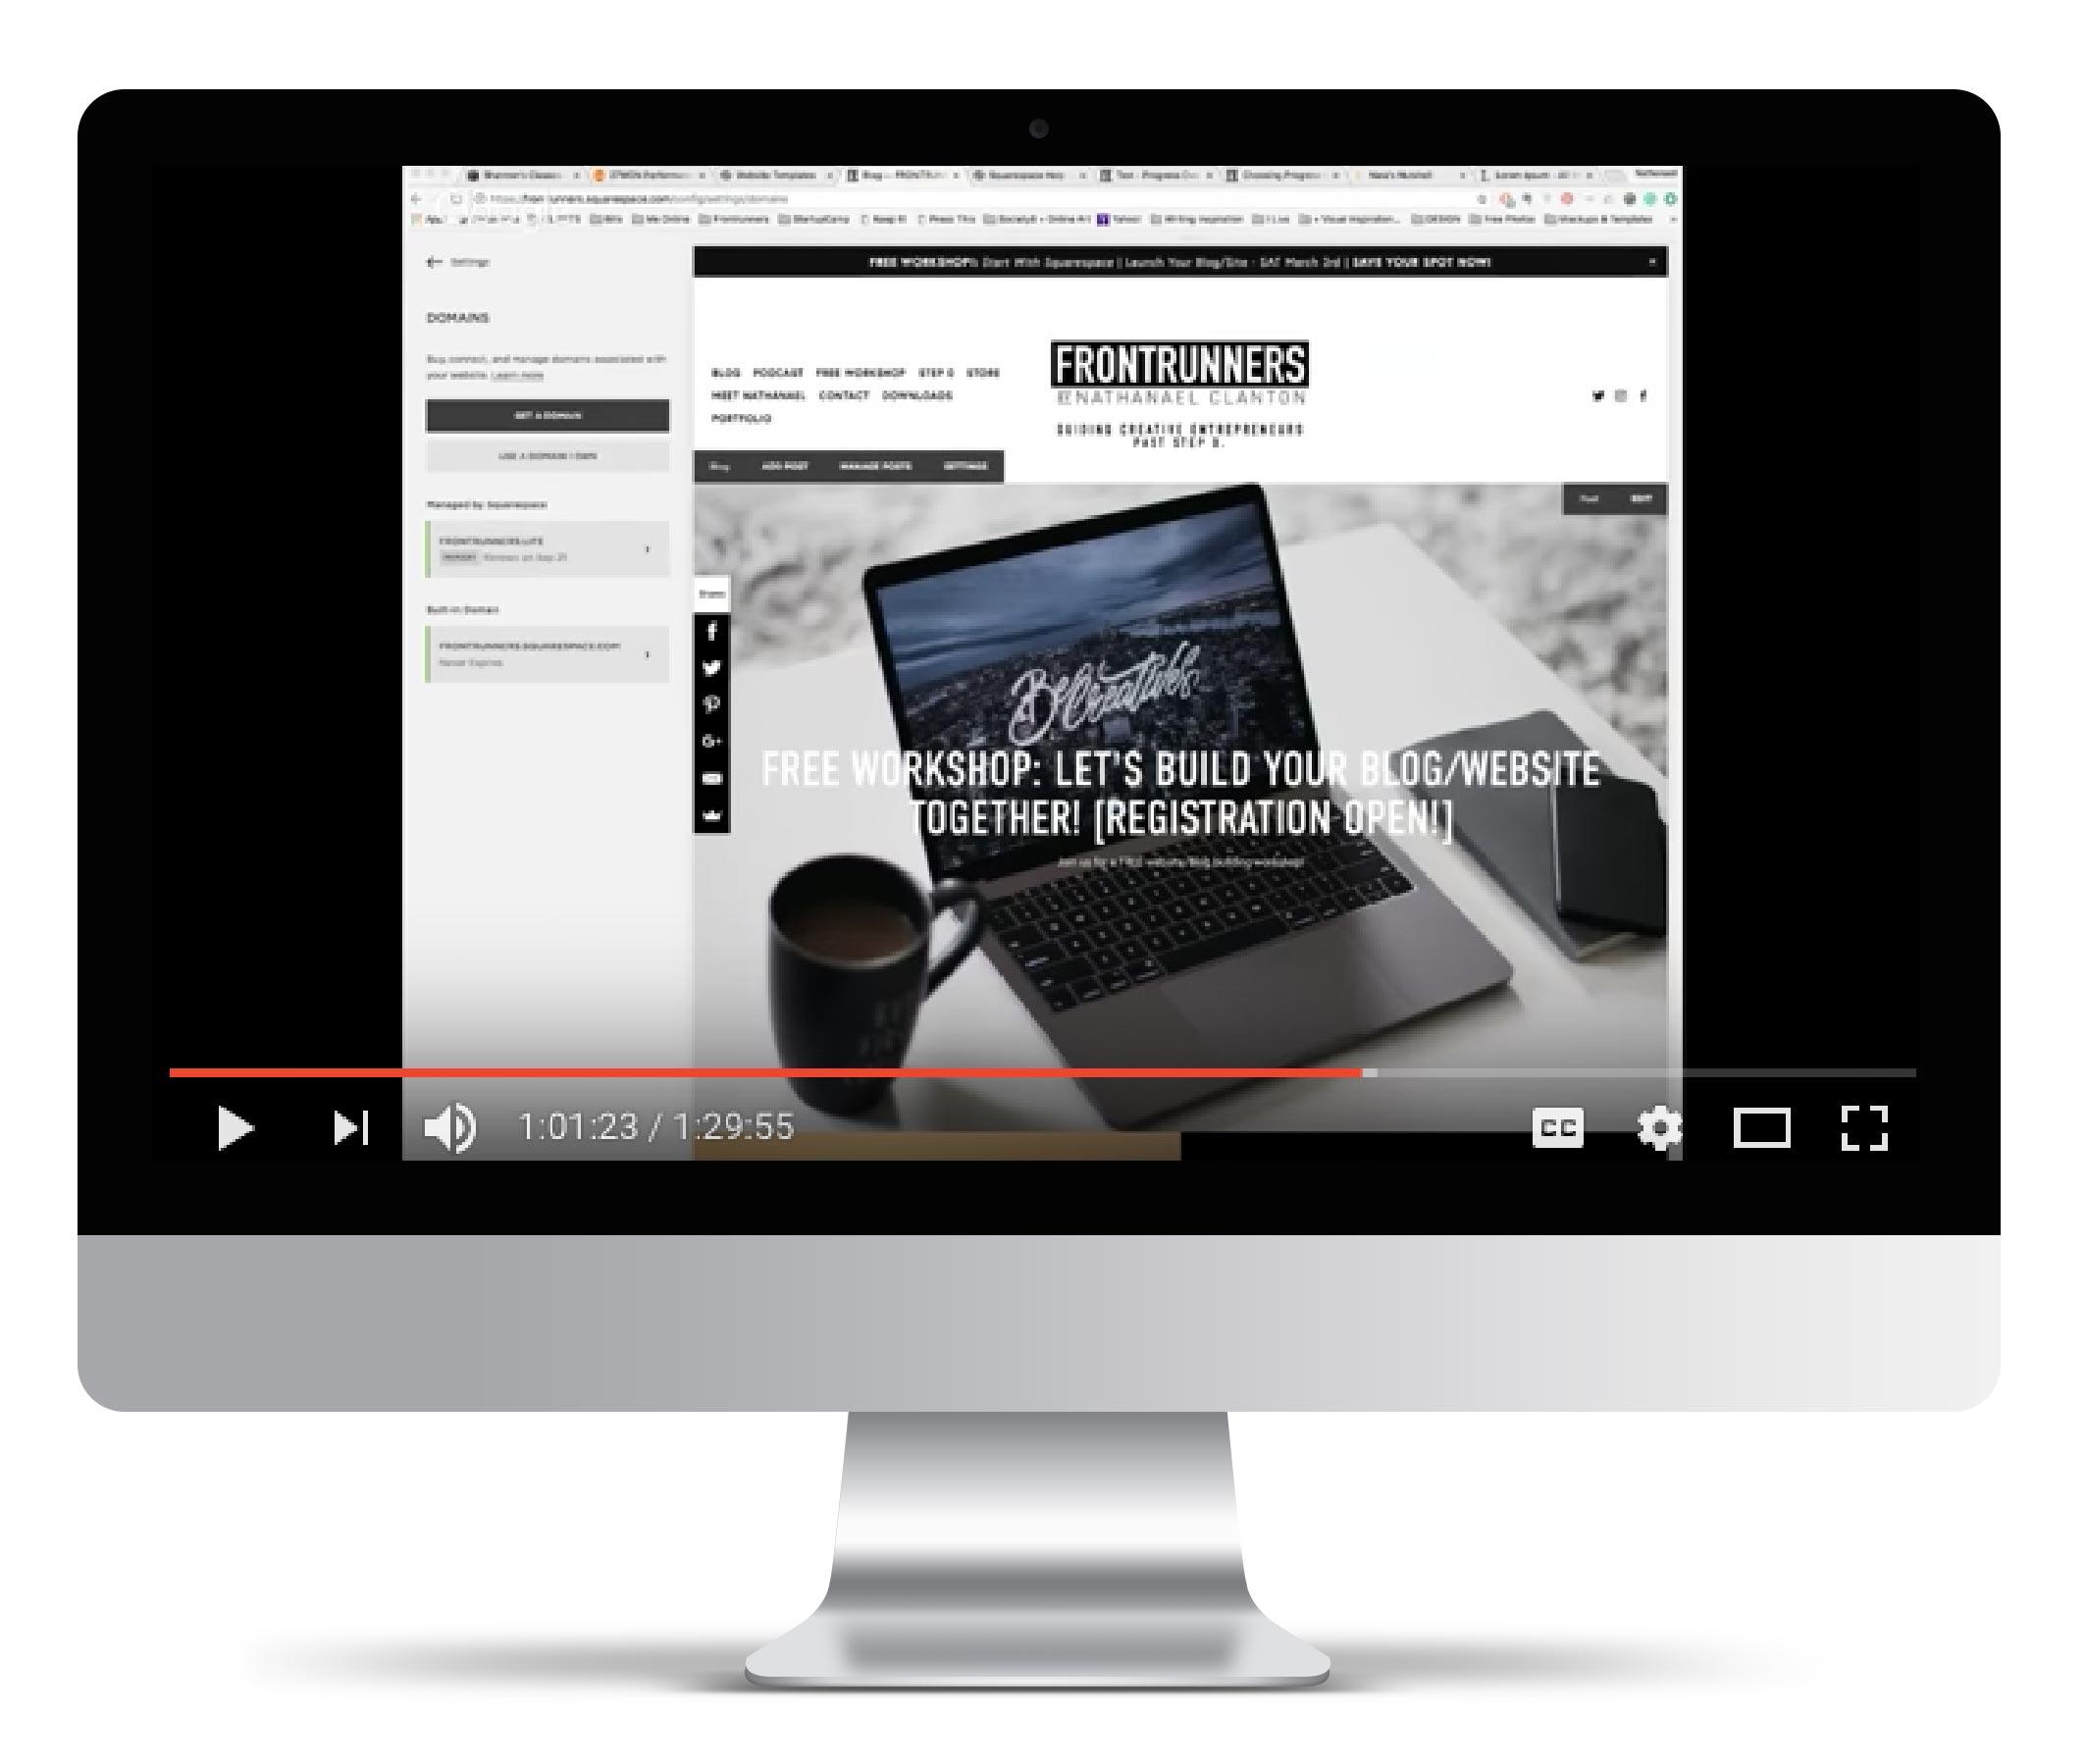 Squarespace-Studio-Apple-Devices1-iMac.jpg